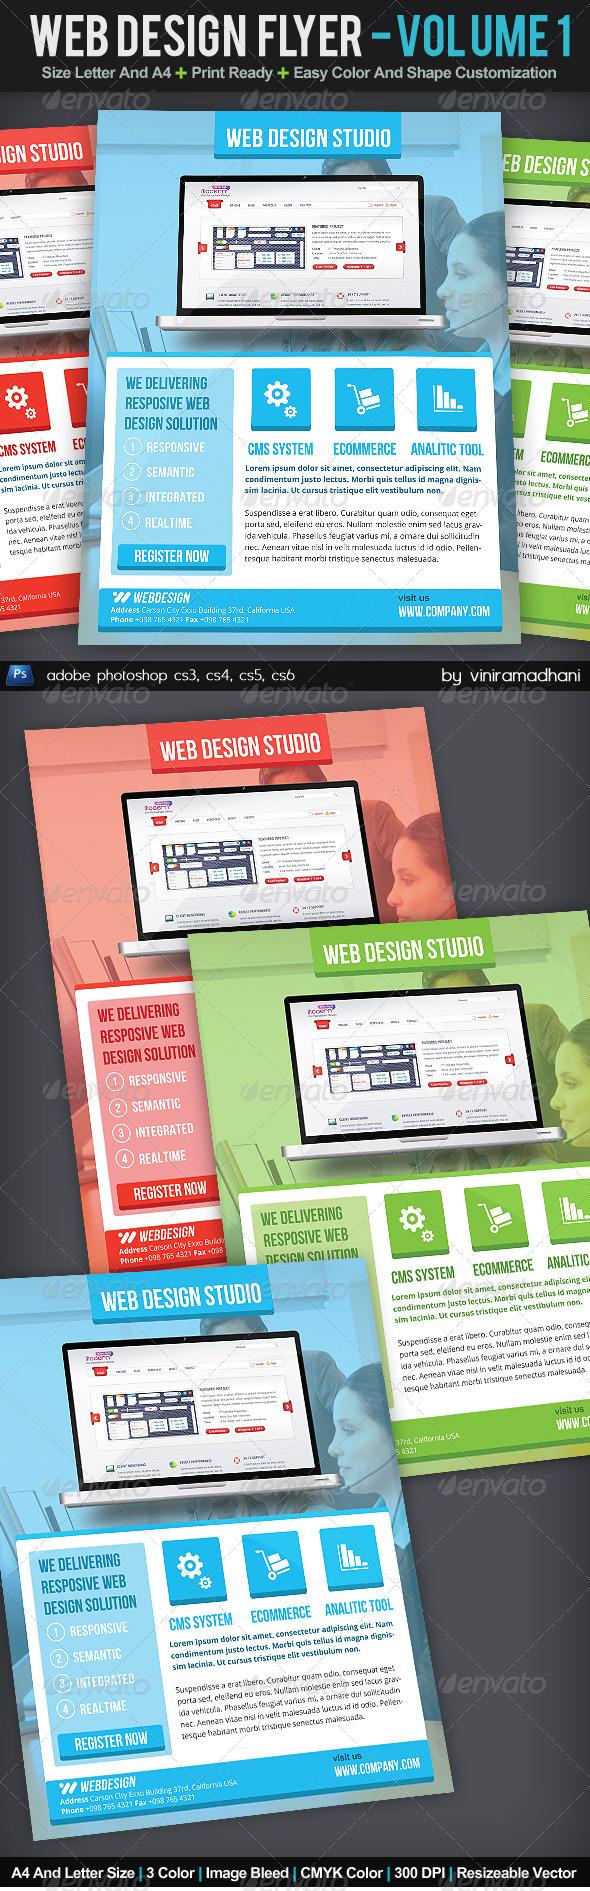 Web Design Flyer | Volume 1 - Corporate Flyers